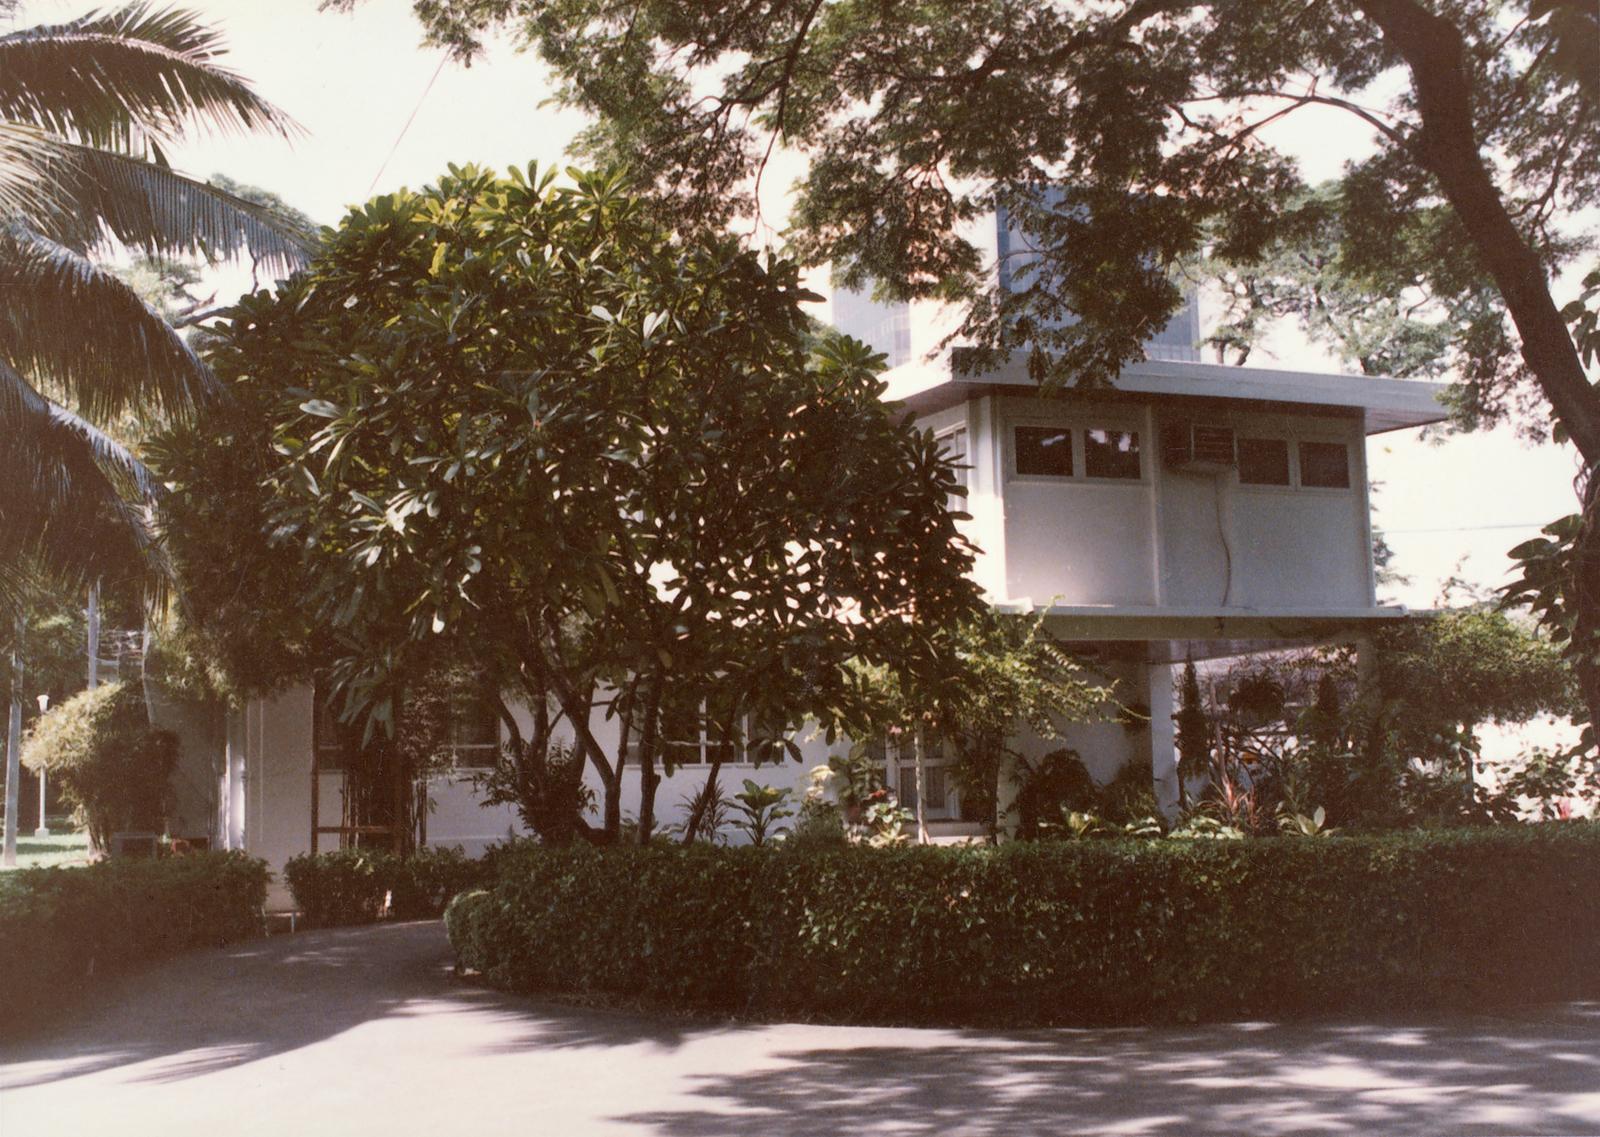 Bangkok - Army Attache Residence - 1980